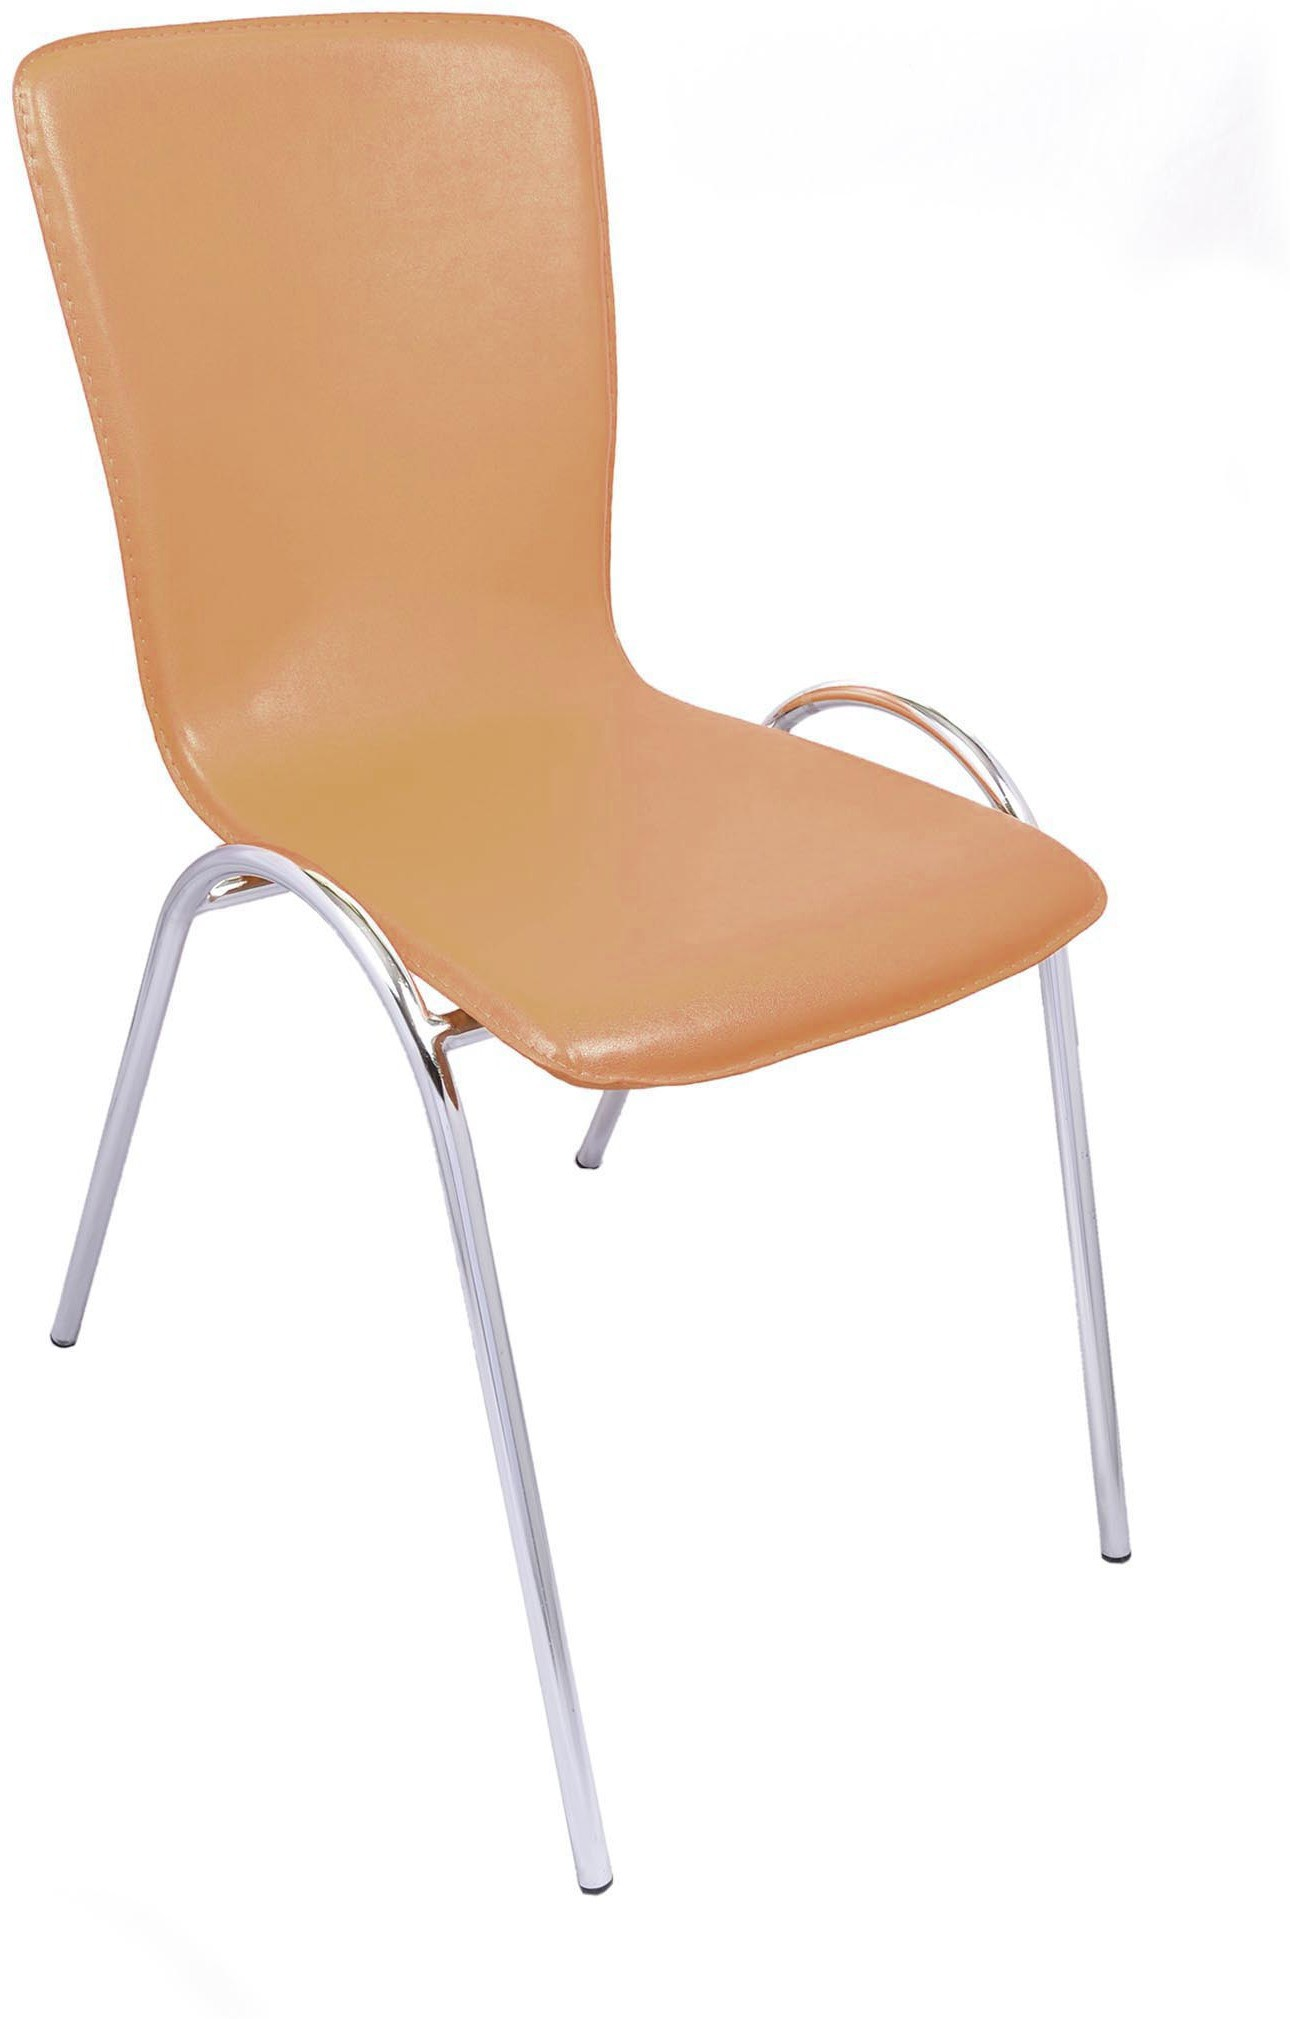 View Darla Interiors Leatherette Office Chair(Beige) Furniture (Darla Interiors)